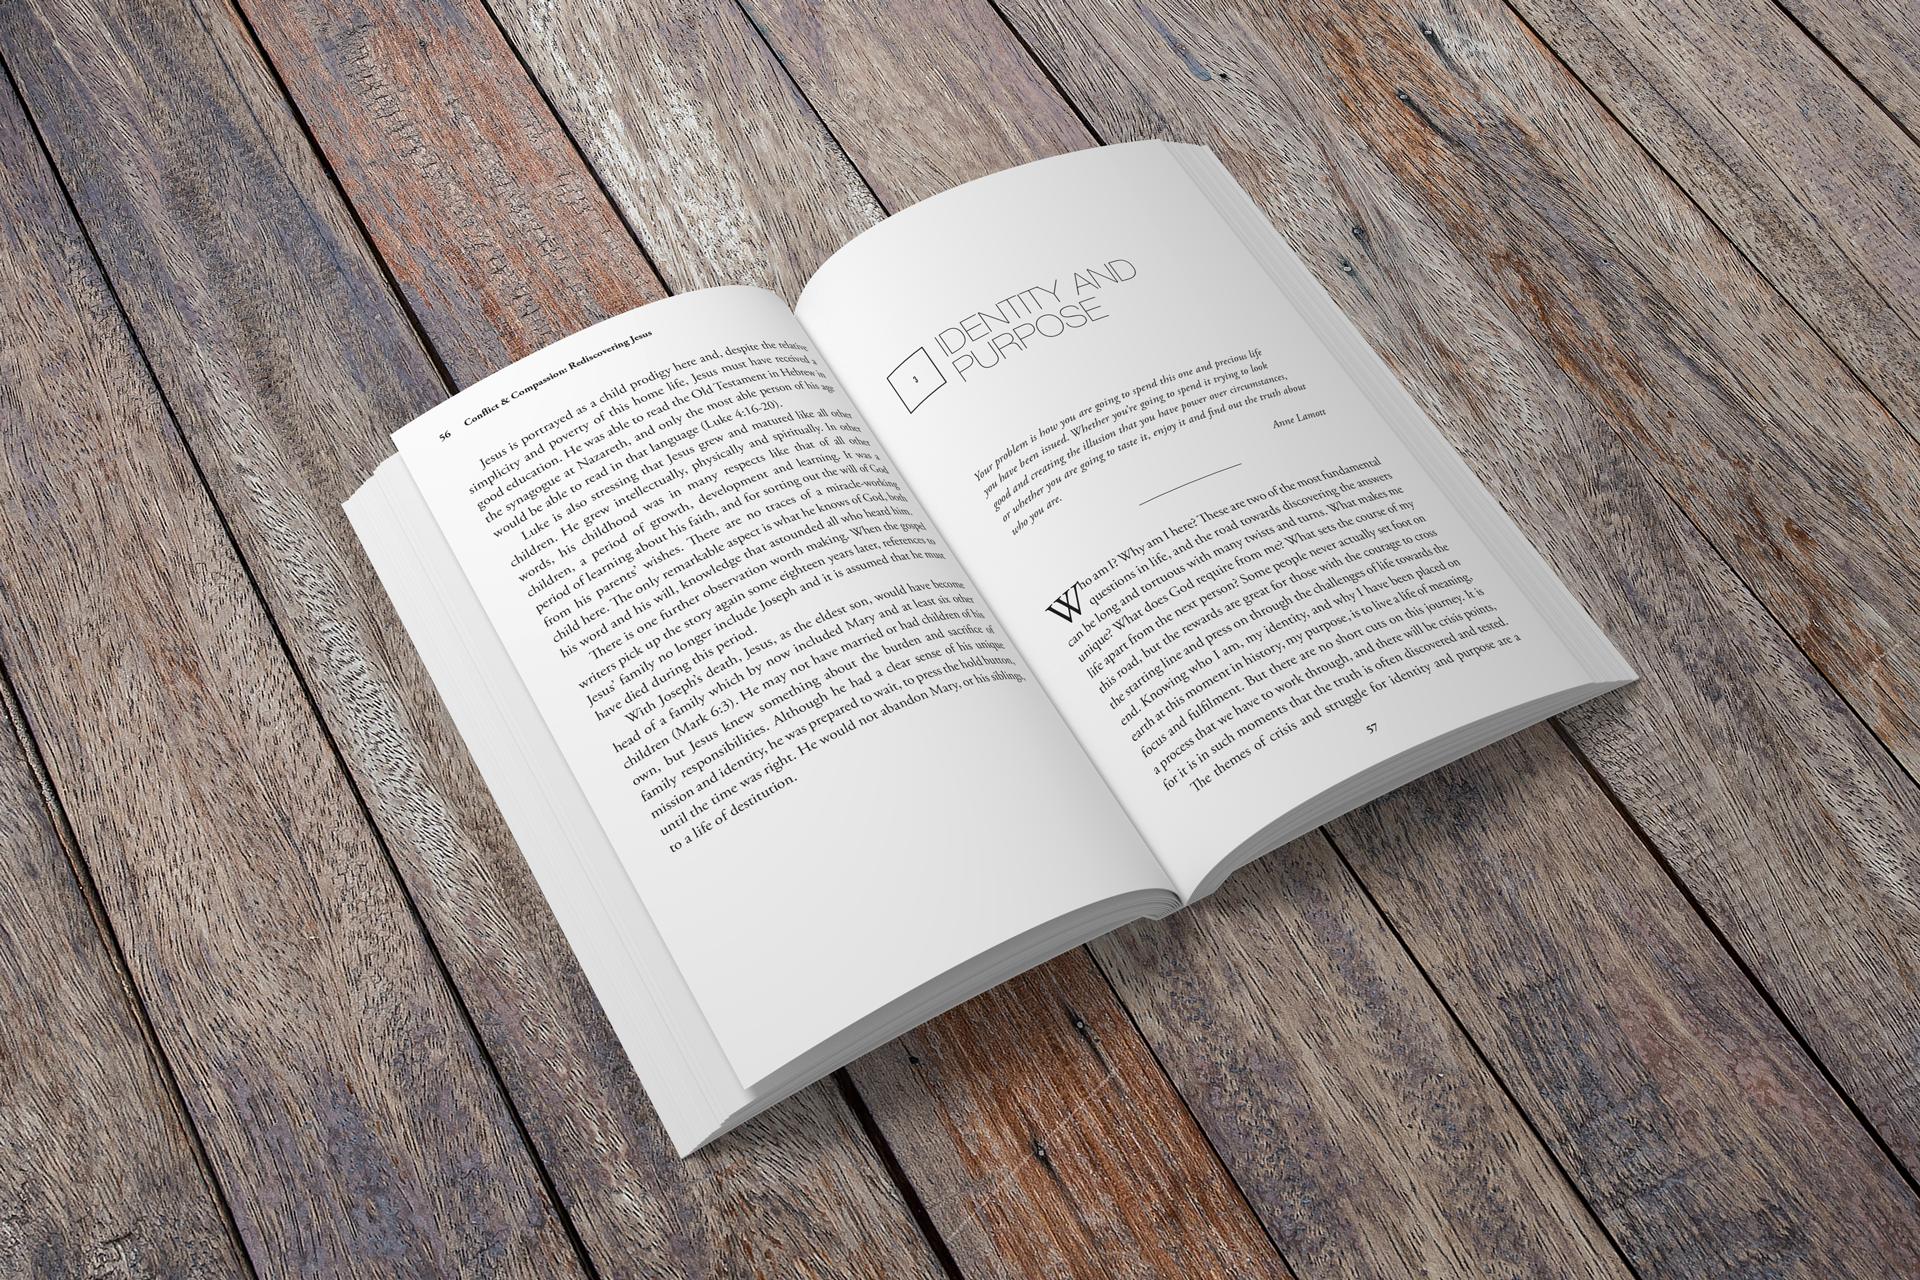 Conflict & Compassion: Rediscovering Jesus, book interior